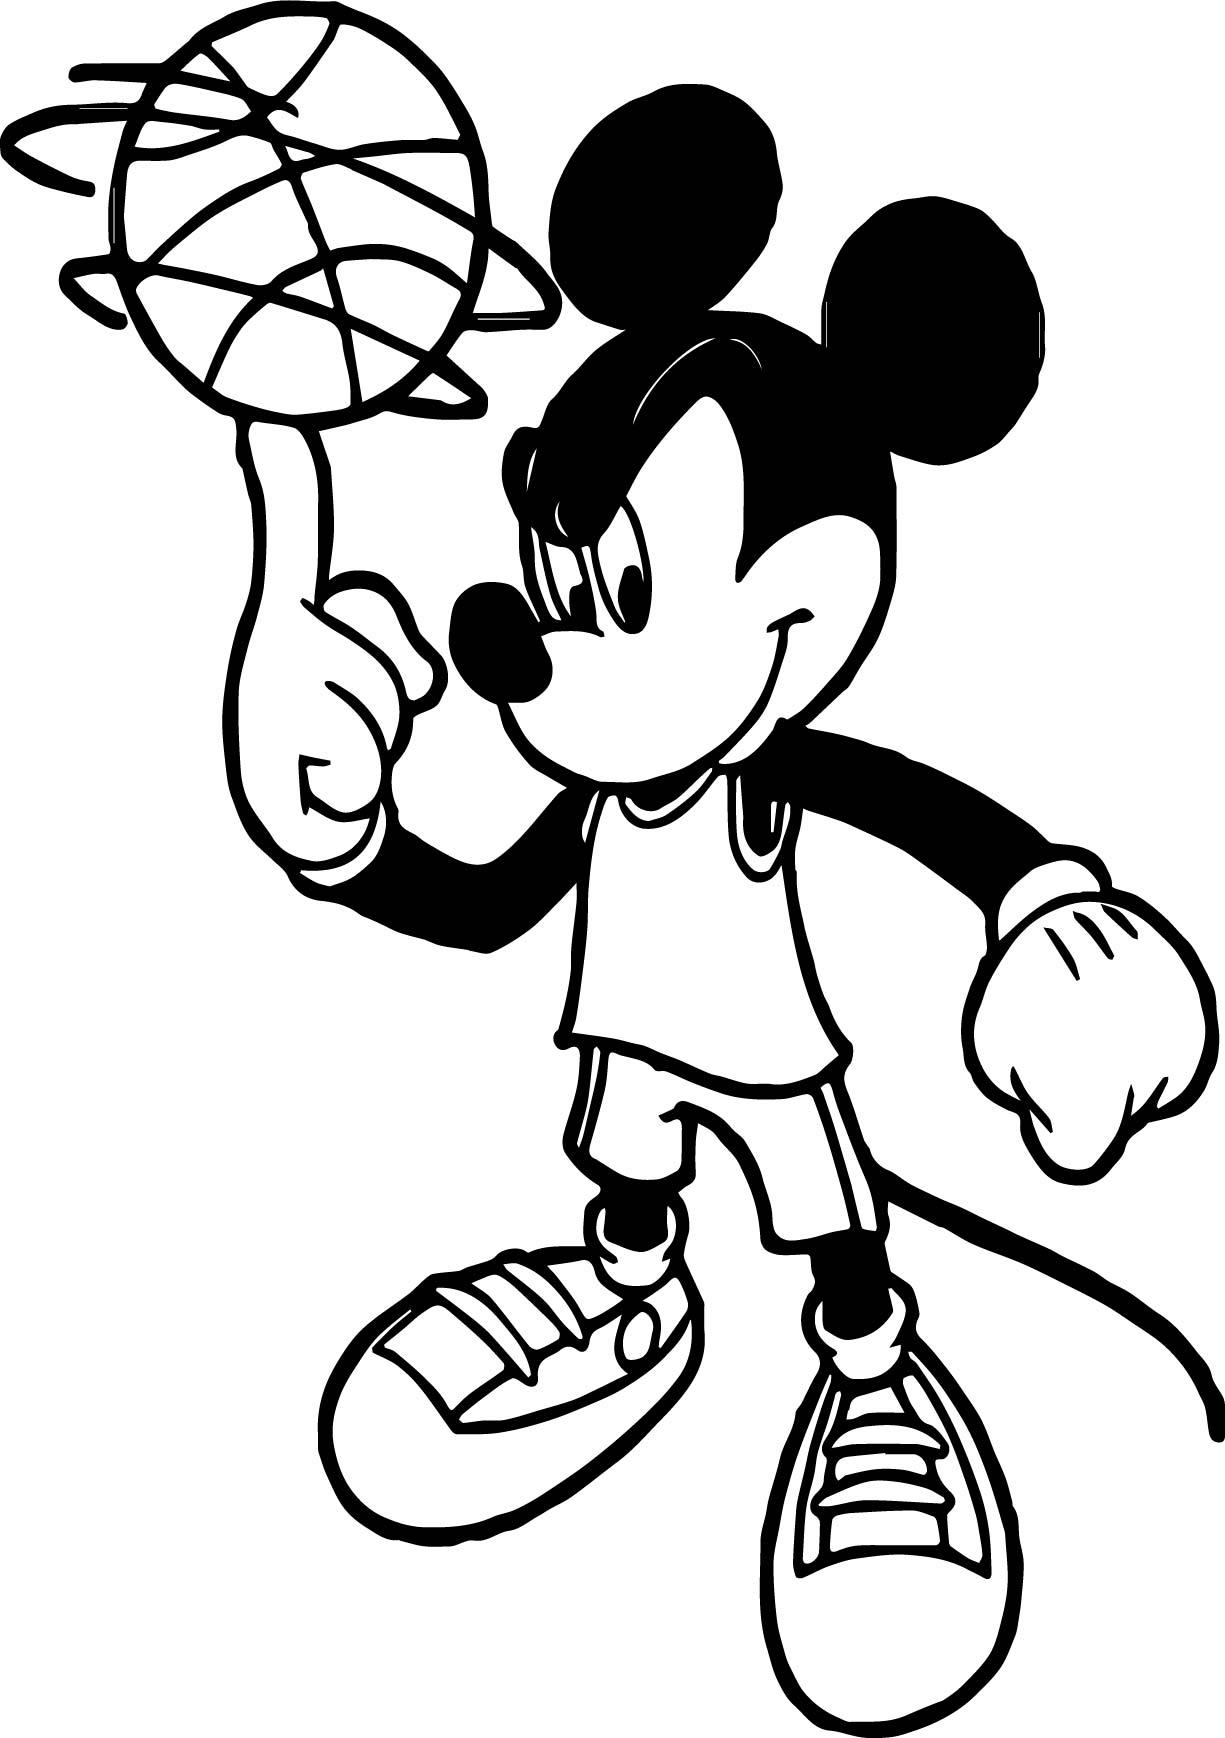 Mickey Playing Basketball Flip Ball Coloring Page